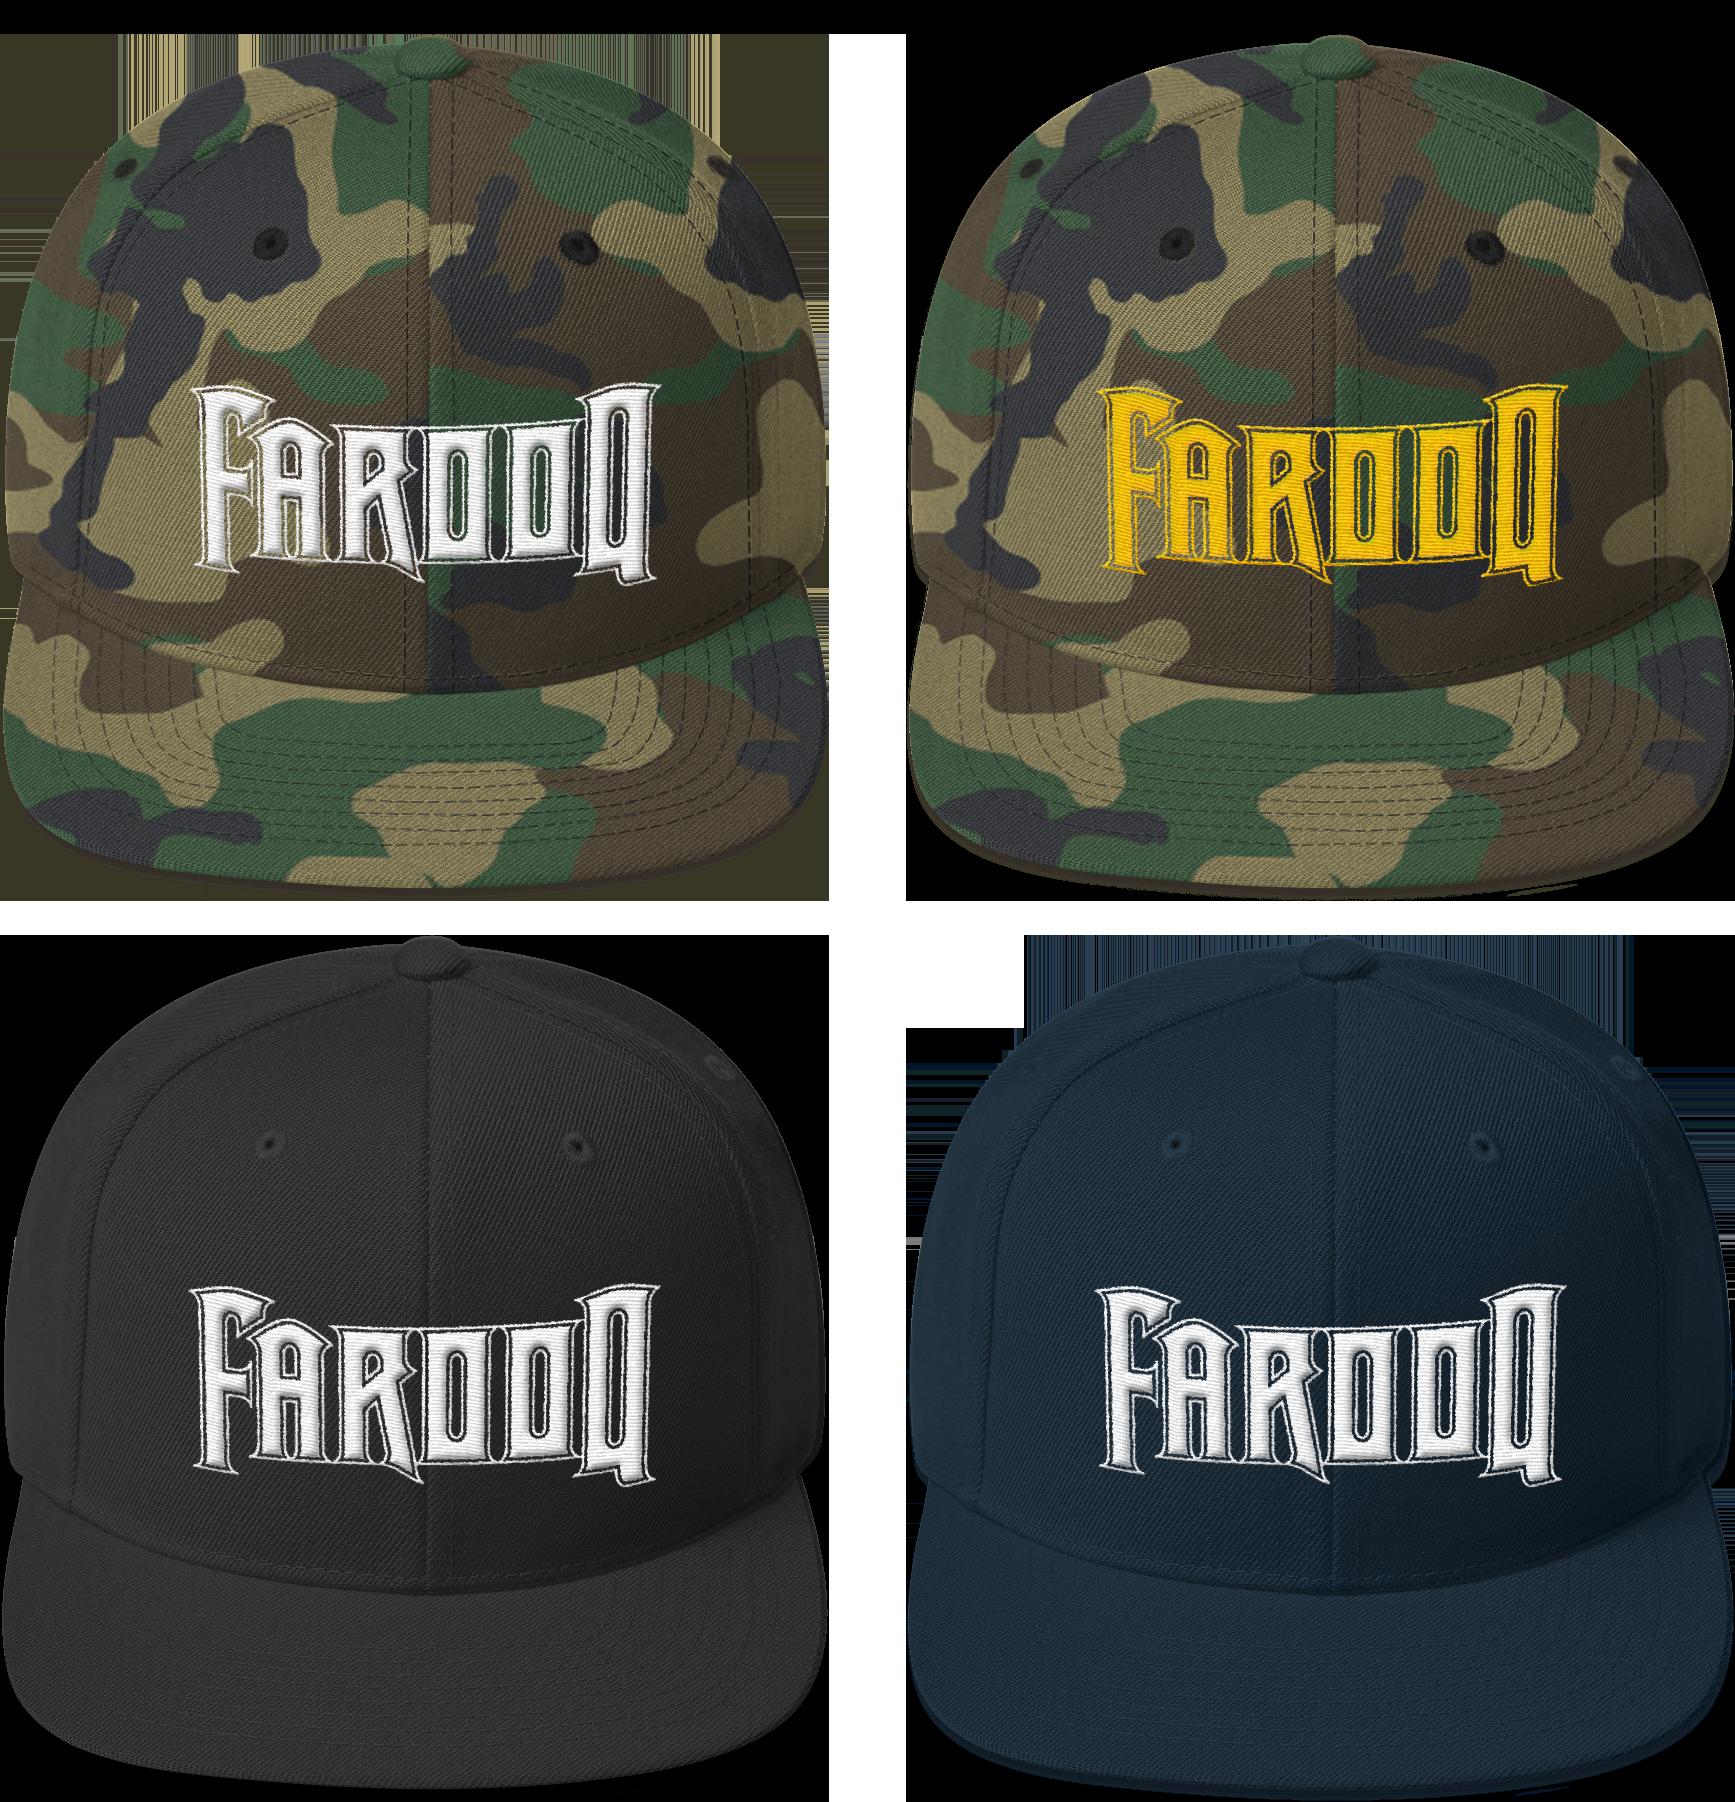 farooqhatscolors.png